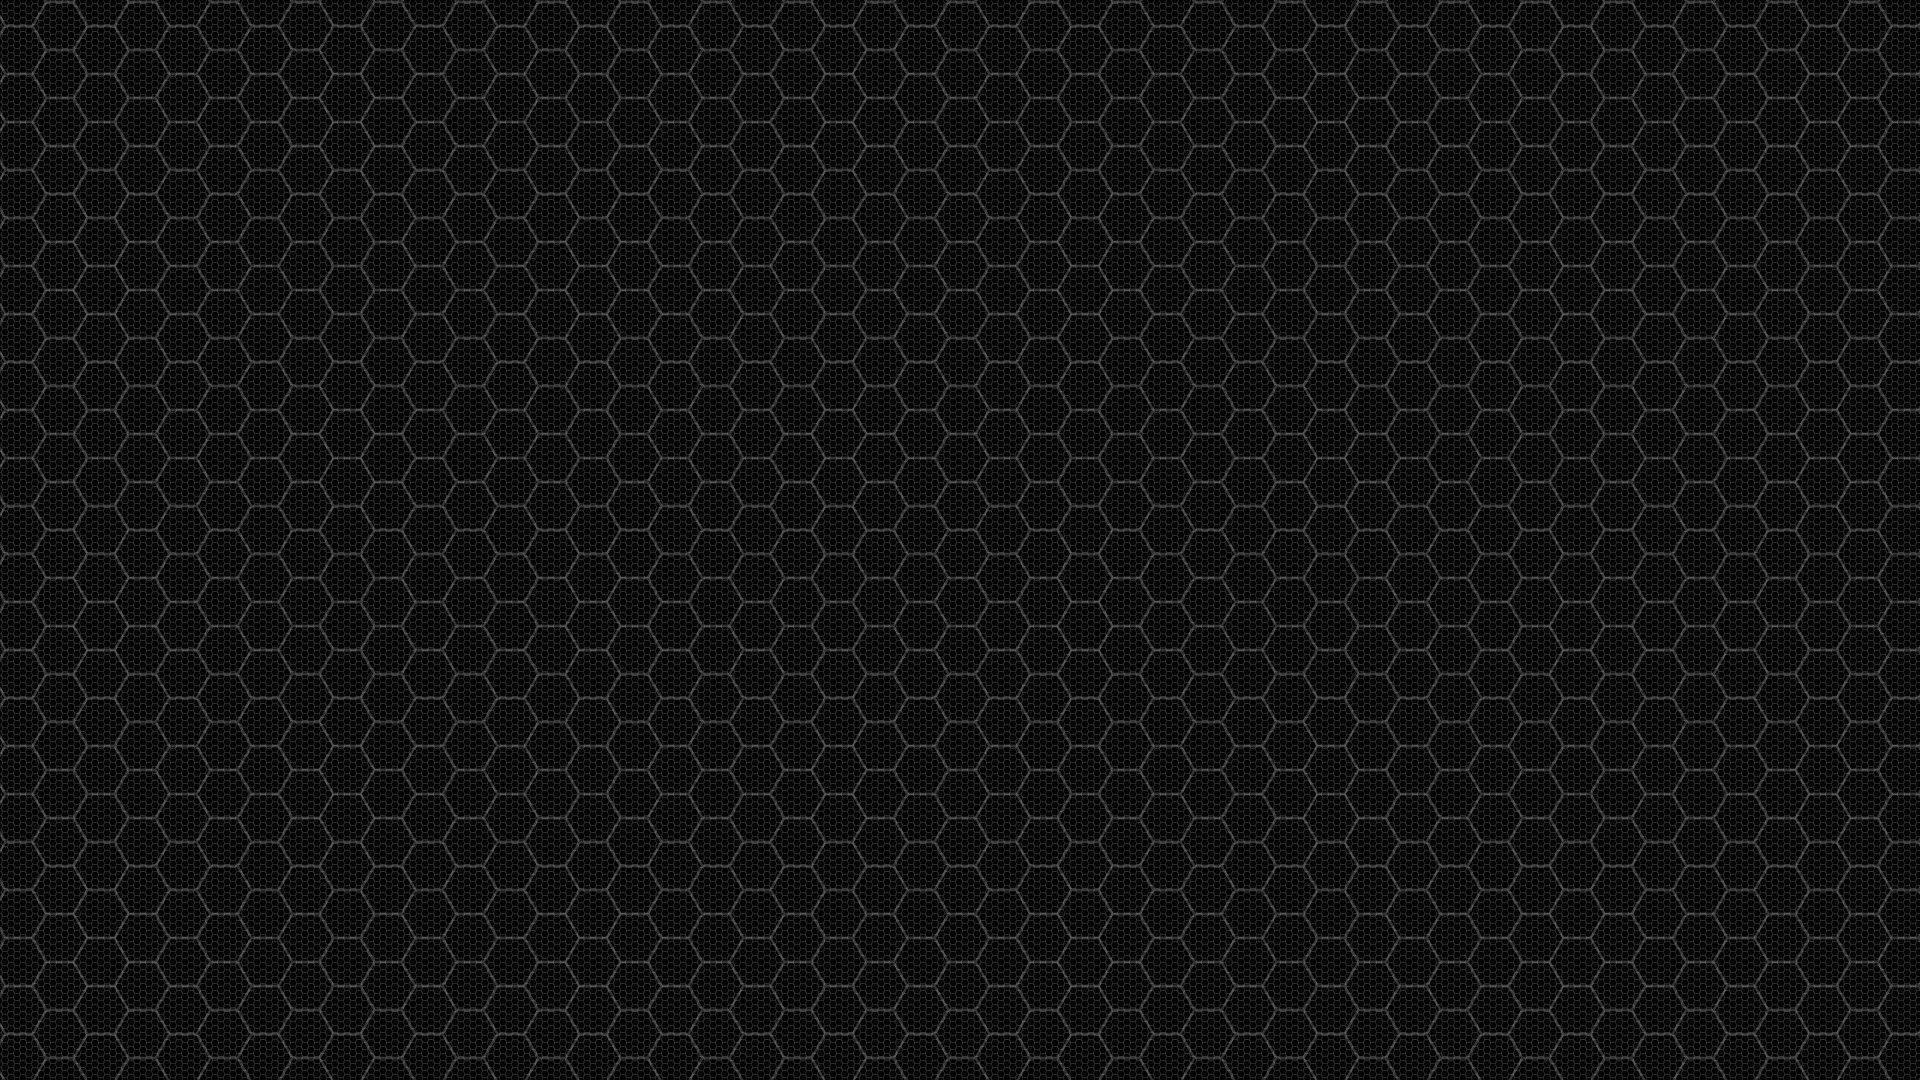 Wallpapers For > Carbon Fiber Wallpaper 1920×1080